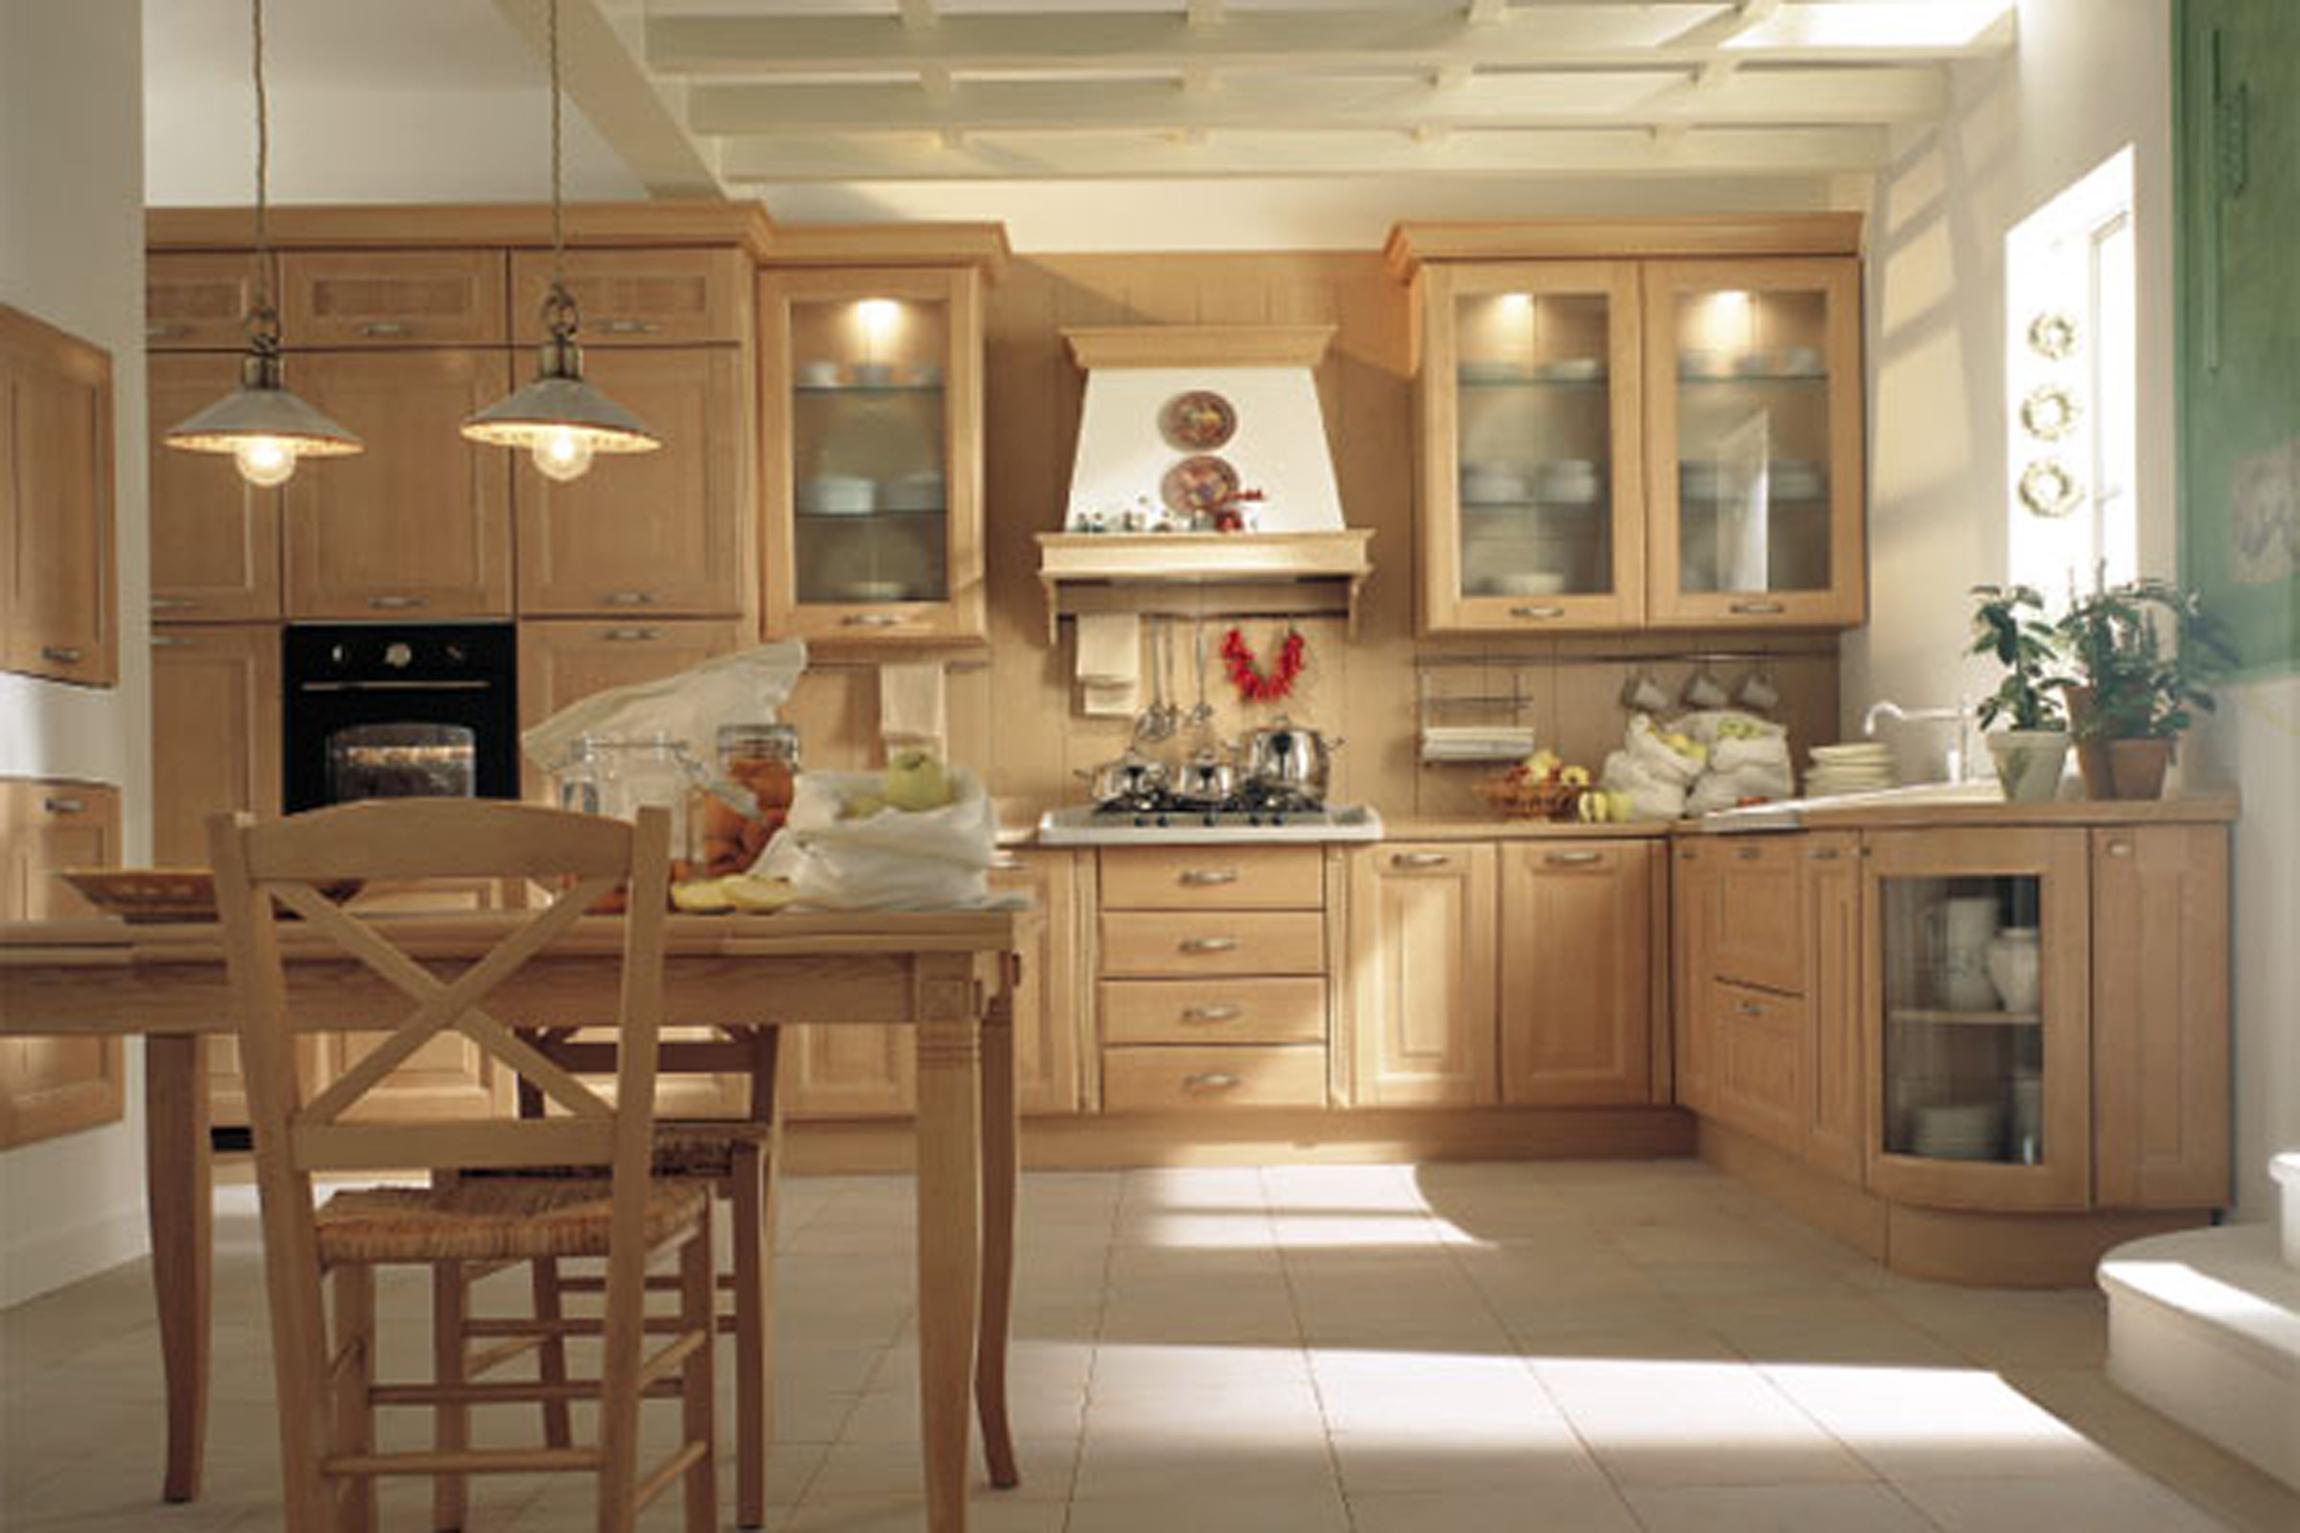 Kitchen Cabinets Provenzale Legno (Image 32 of 38)